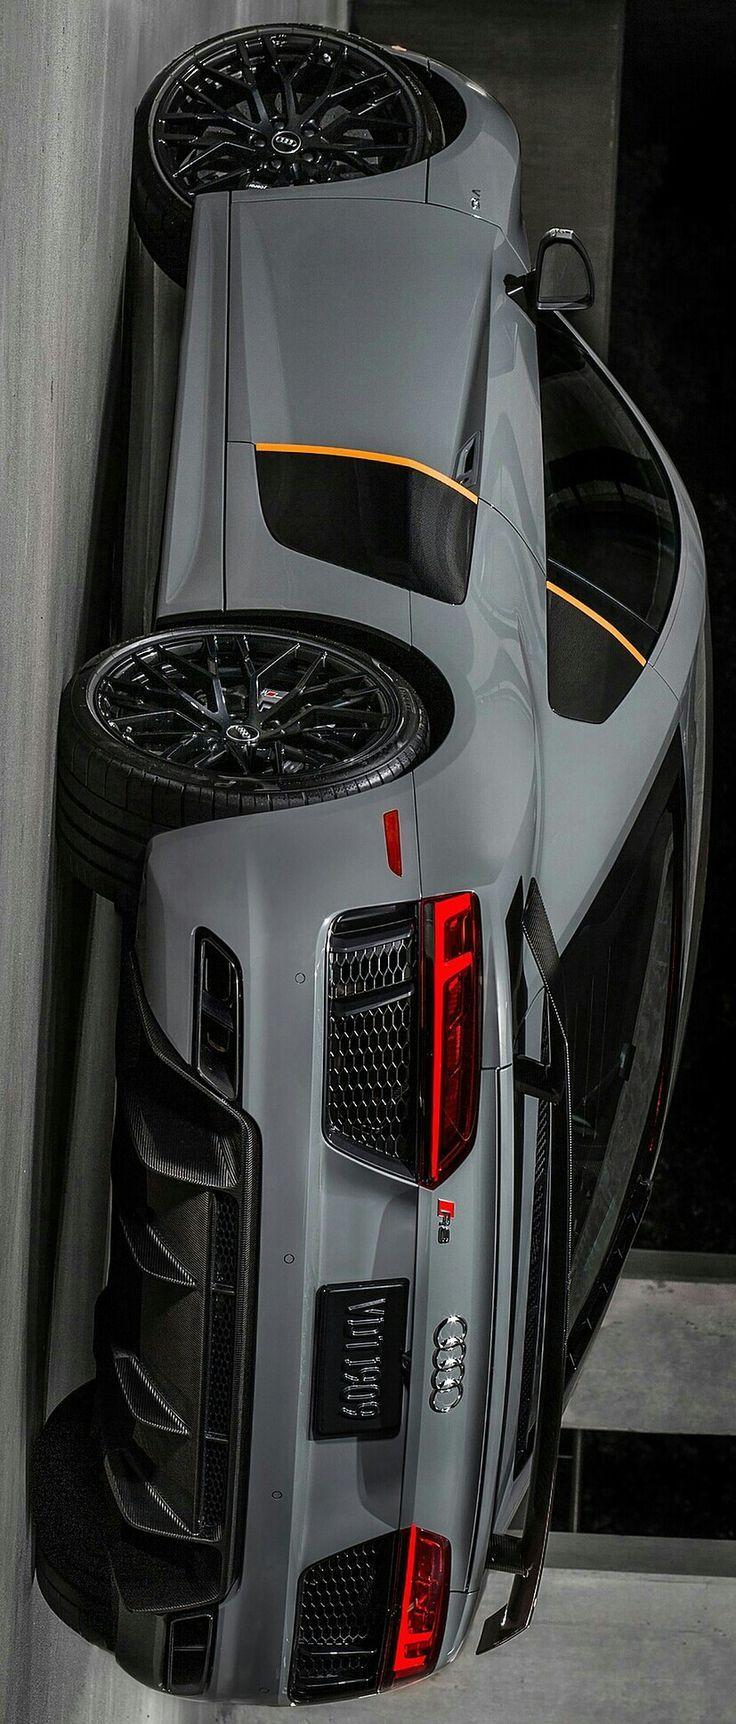 2017 Audi R8 V10 Plus Exclusive Edition $229,200 ... Машины Будущего Ауди